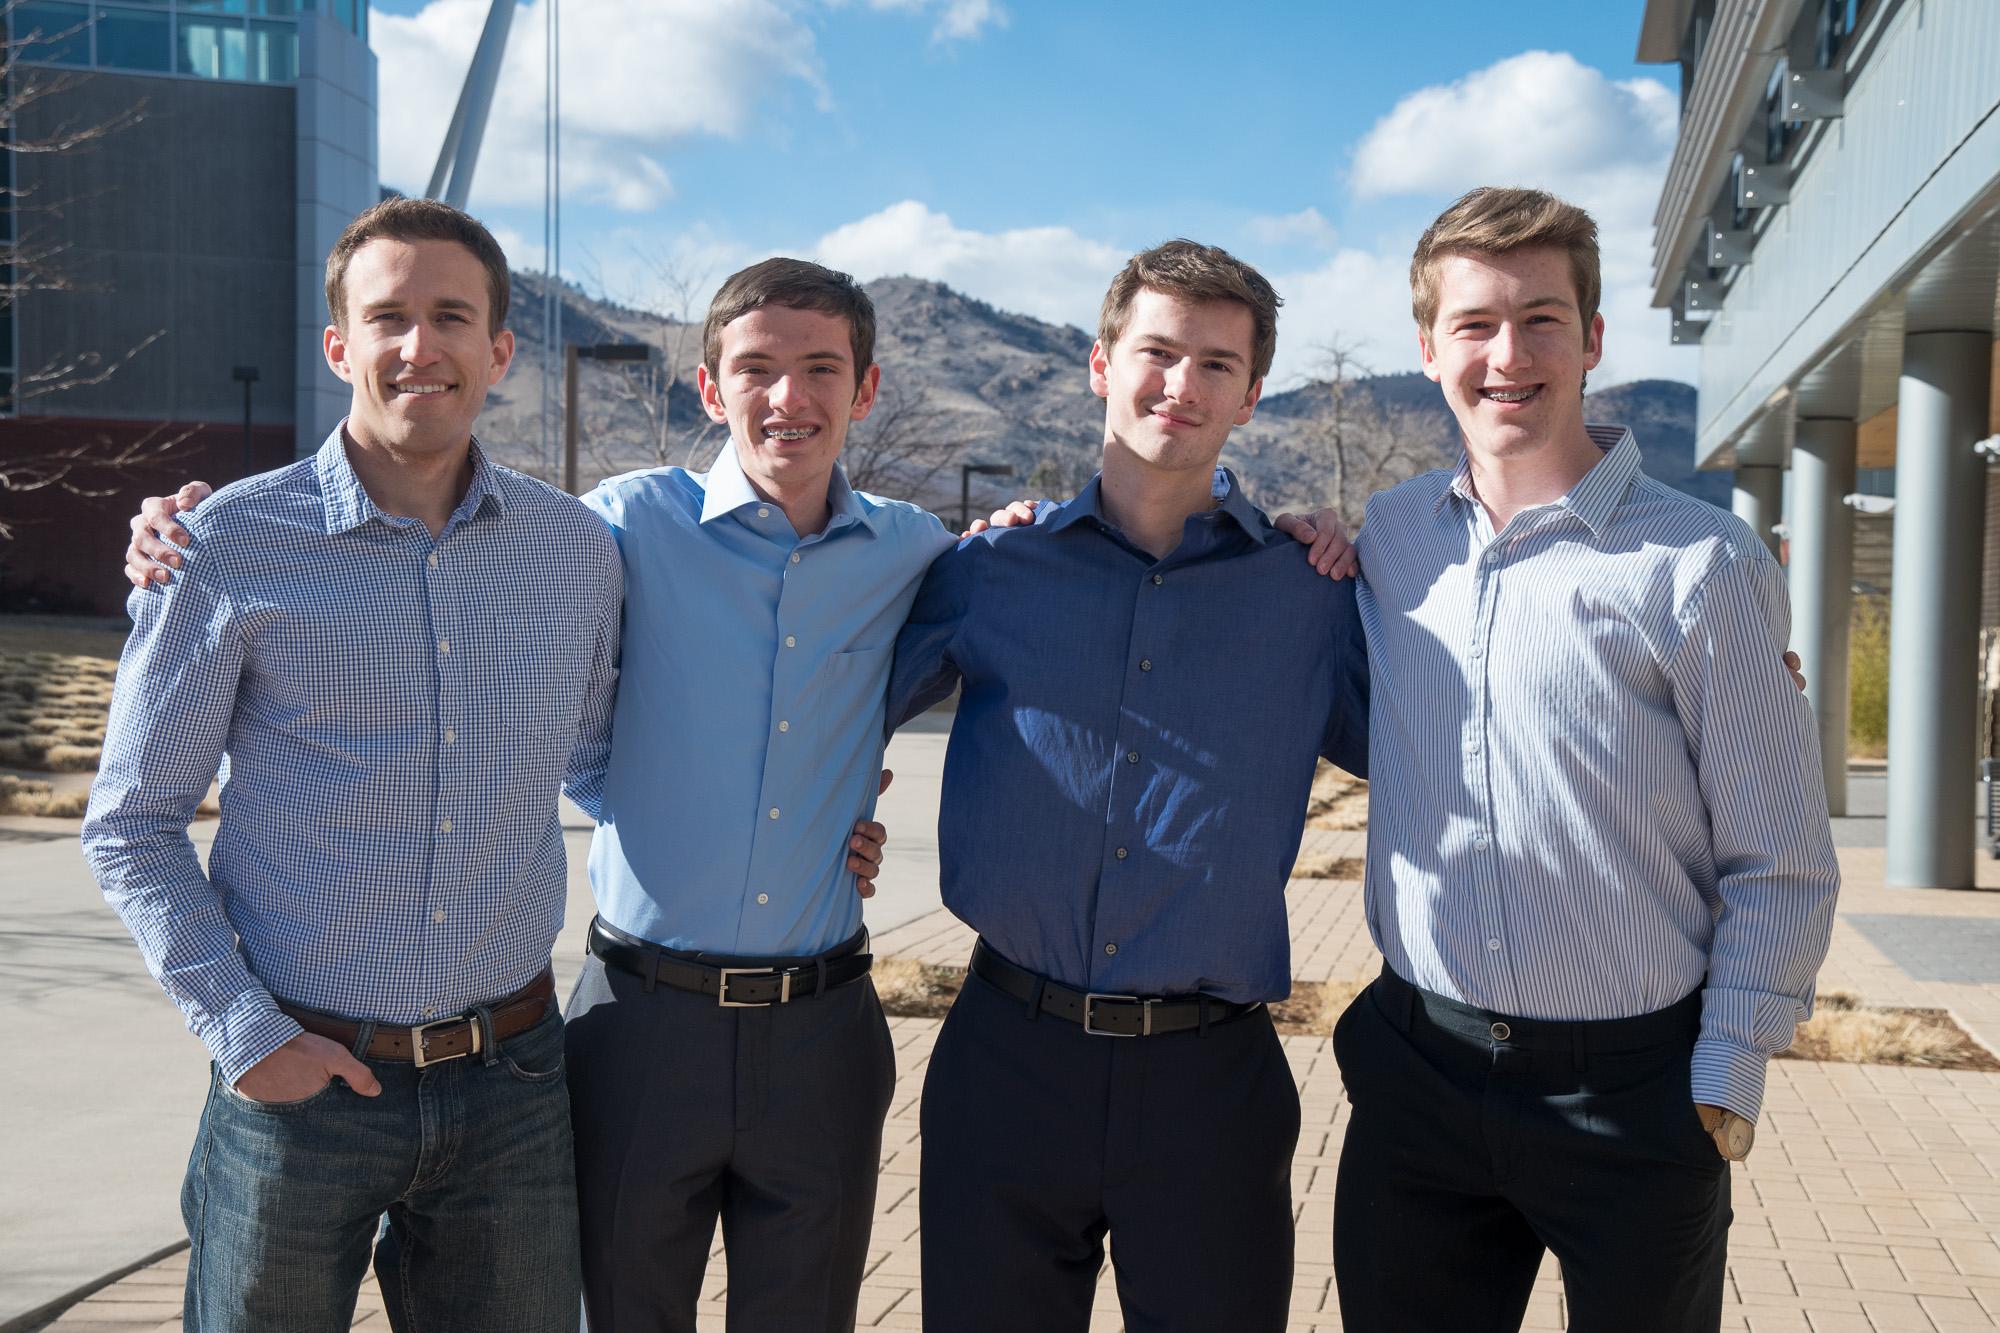 From left, Adam Marcinowski, Michael Thuis, Torin Johnson and Curtis Harrison.